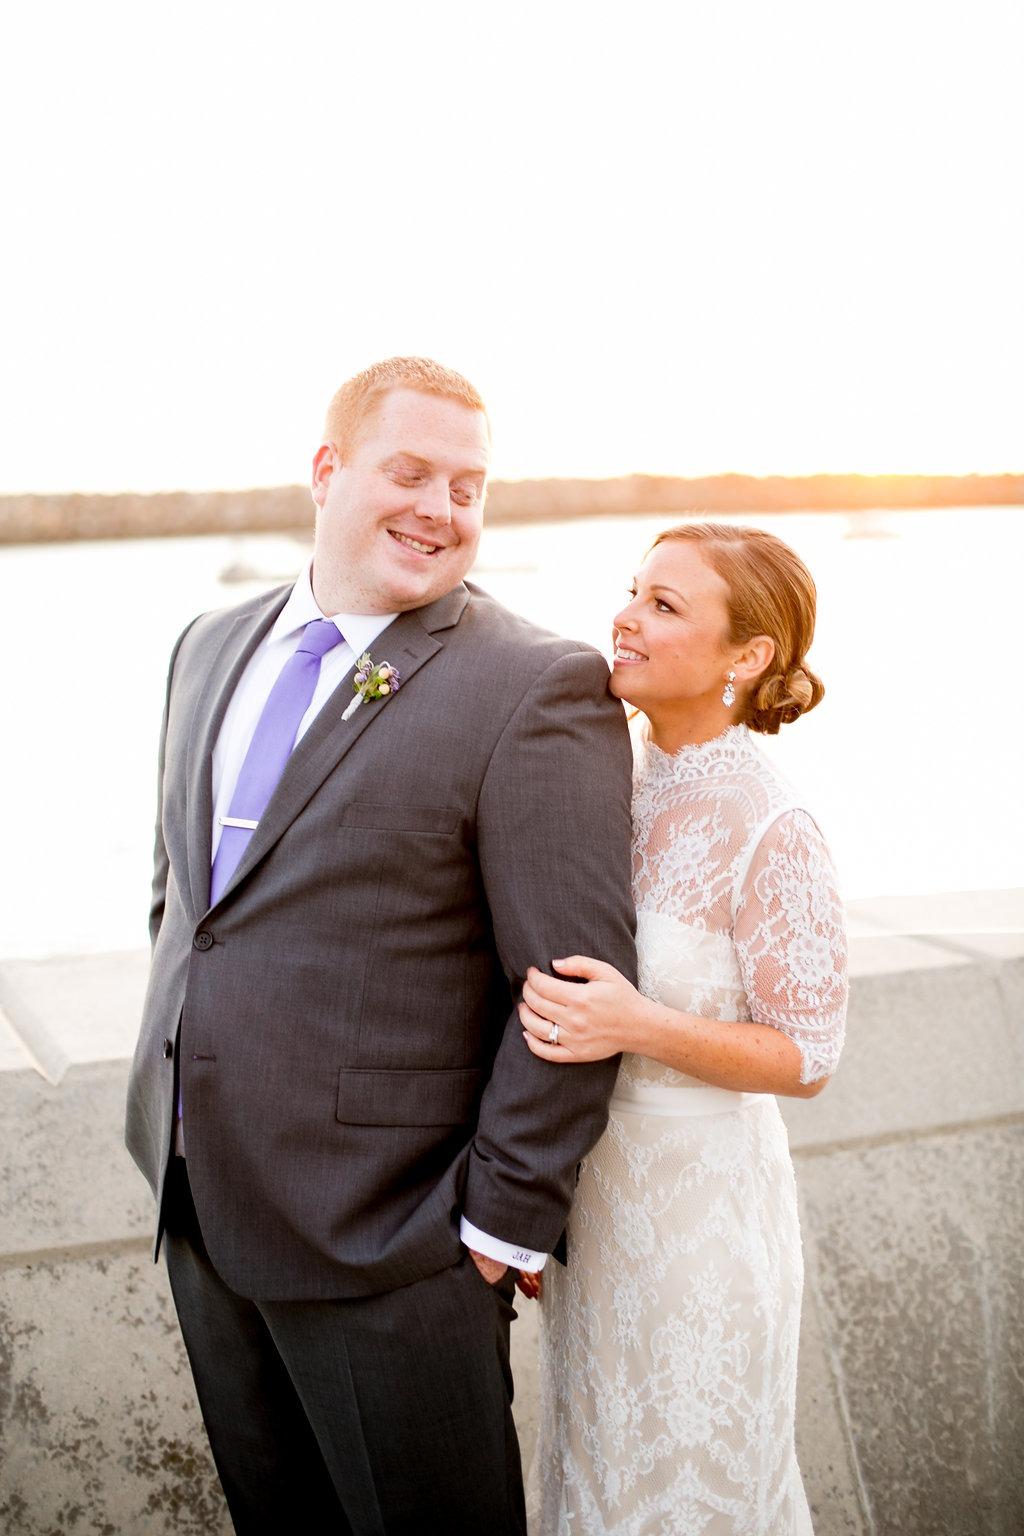 Wedding Decor Archives - No Worries Event Planning